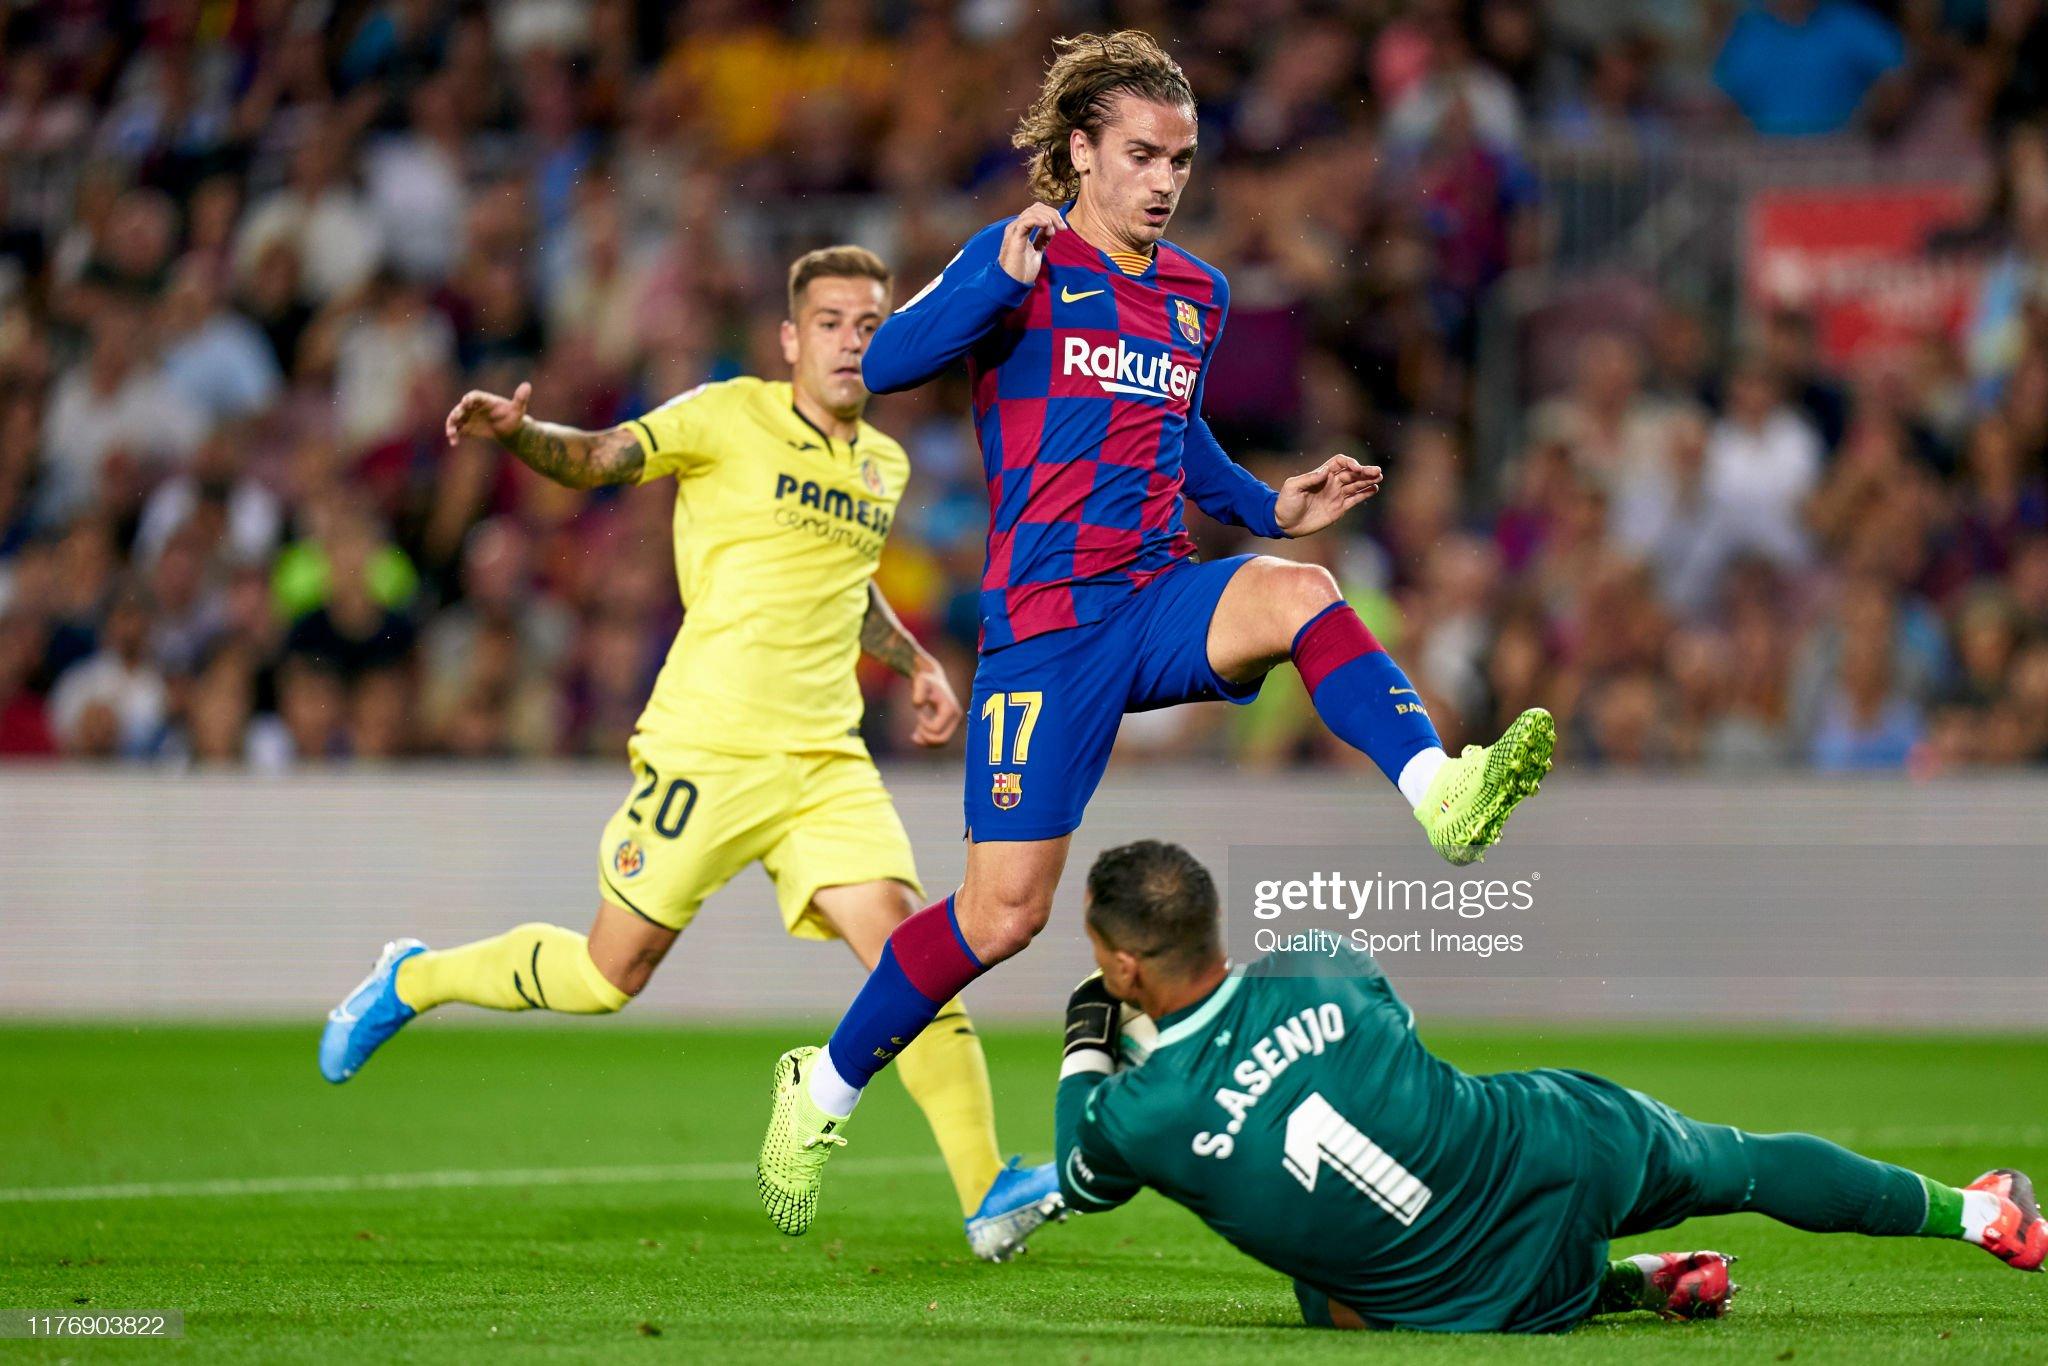 صور مباراة : برشلونة - فياريال 2-1 ( 24-09-2019 )  Antoine-griezmann-of-fc-barcelona-competes-for-the-ball-with-sergio-picture-id1176903822?s=2048x2048